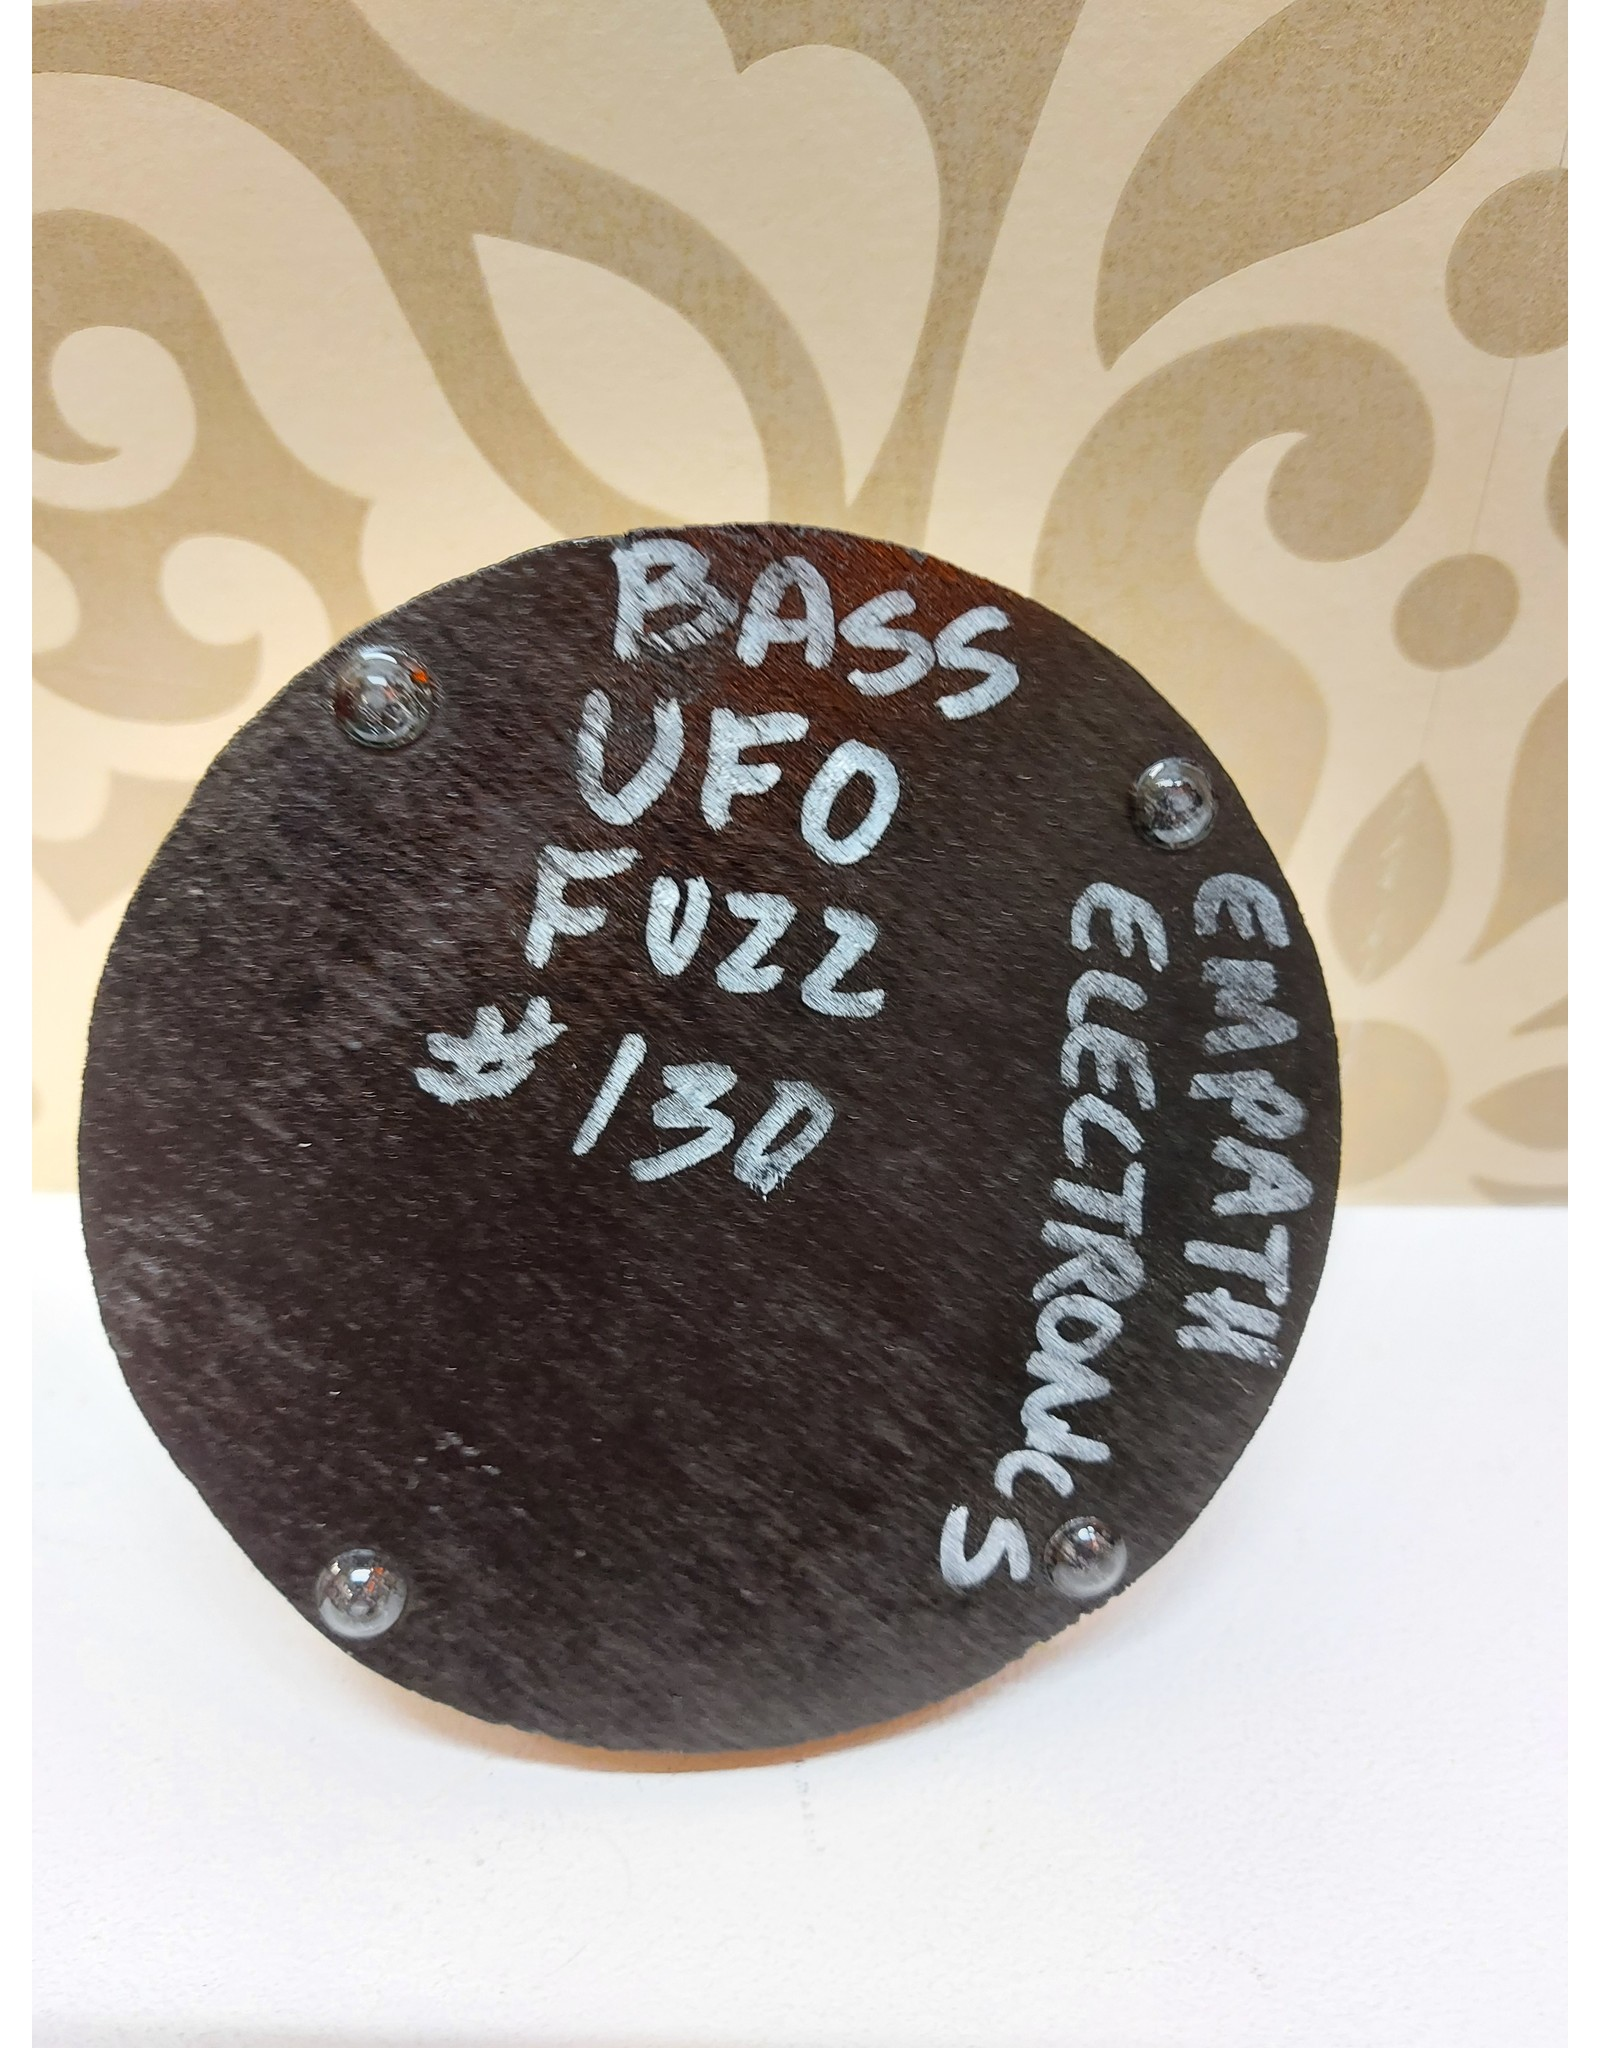 Empath Electronics Empath Electronics Ufo fuzz Bass